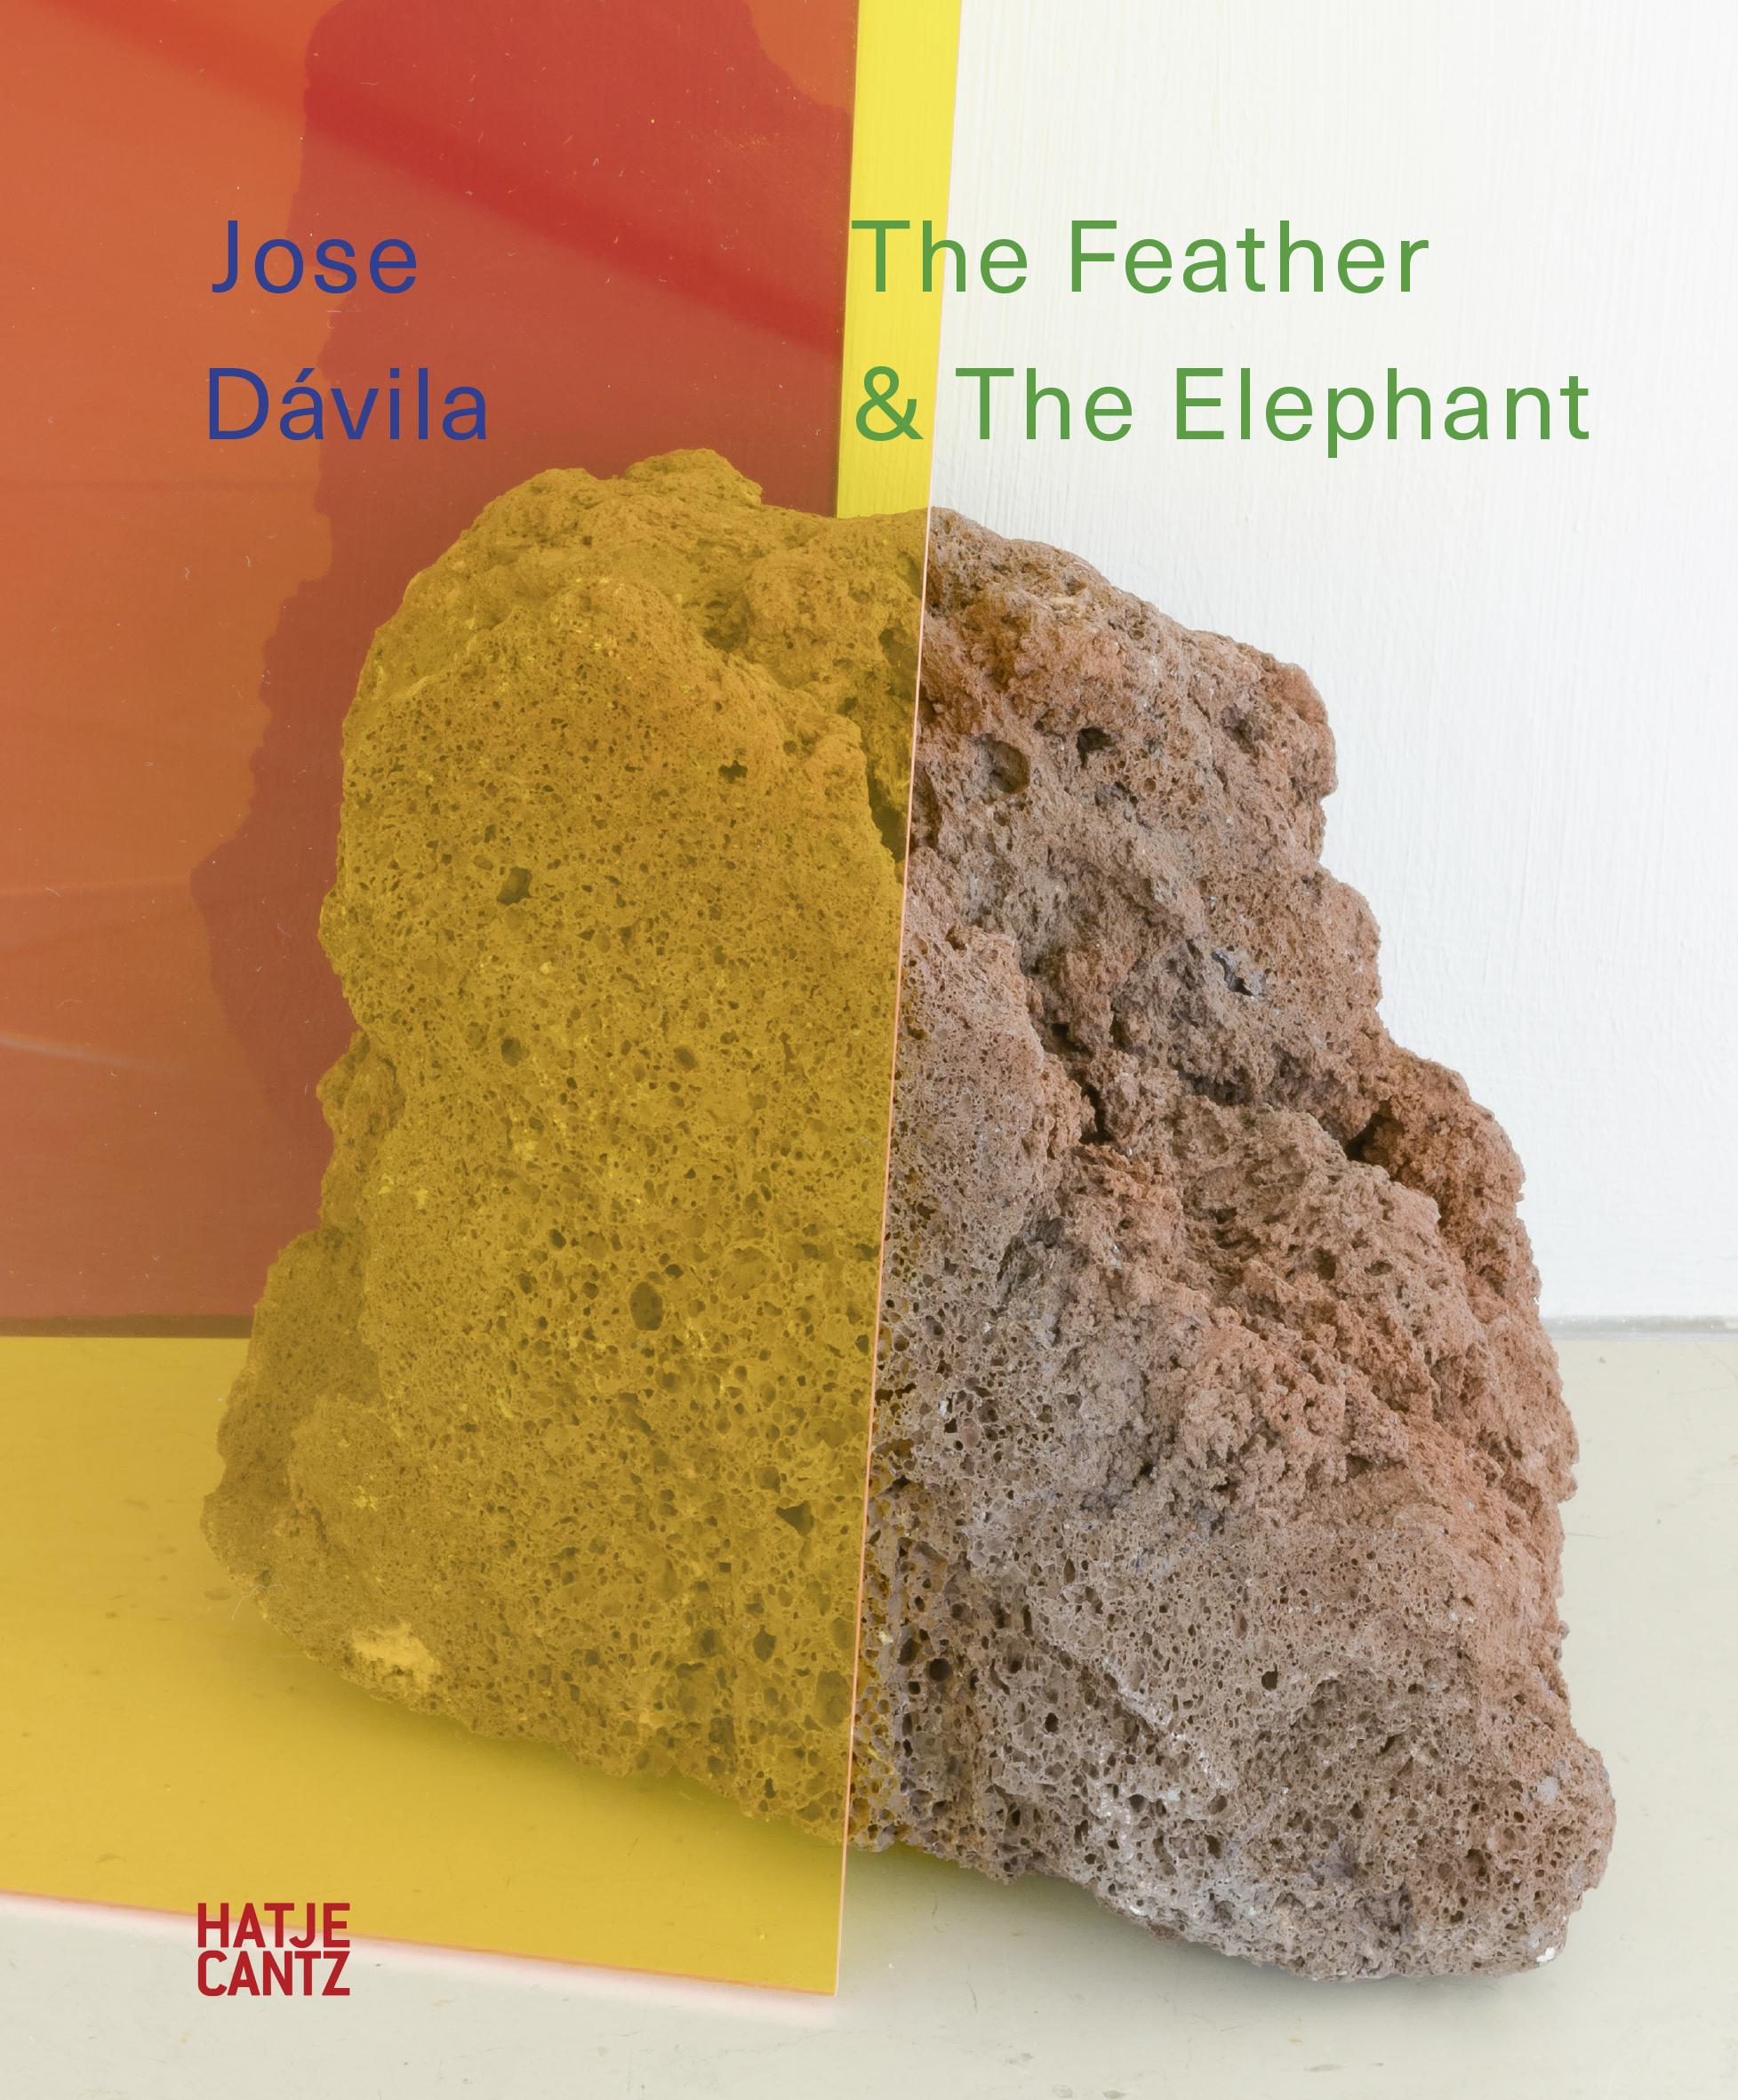 Publication: Jose Dávila. The Feather & the Elephant, © Hatje Cantz Verlag